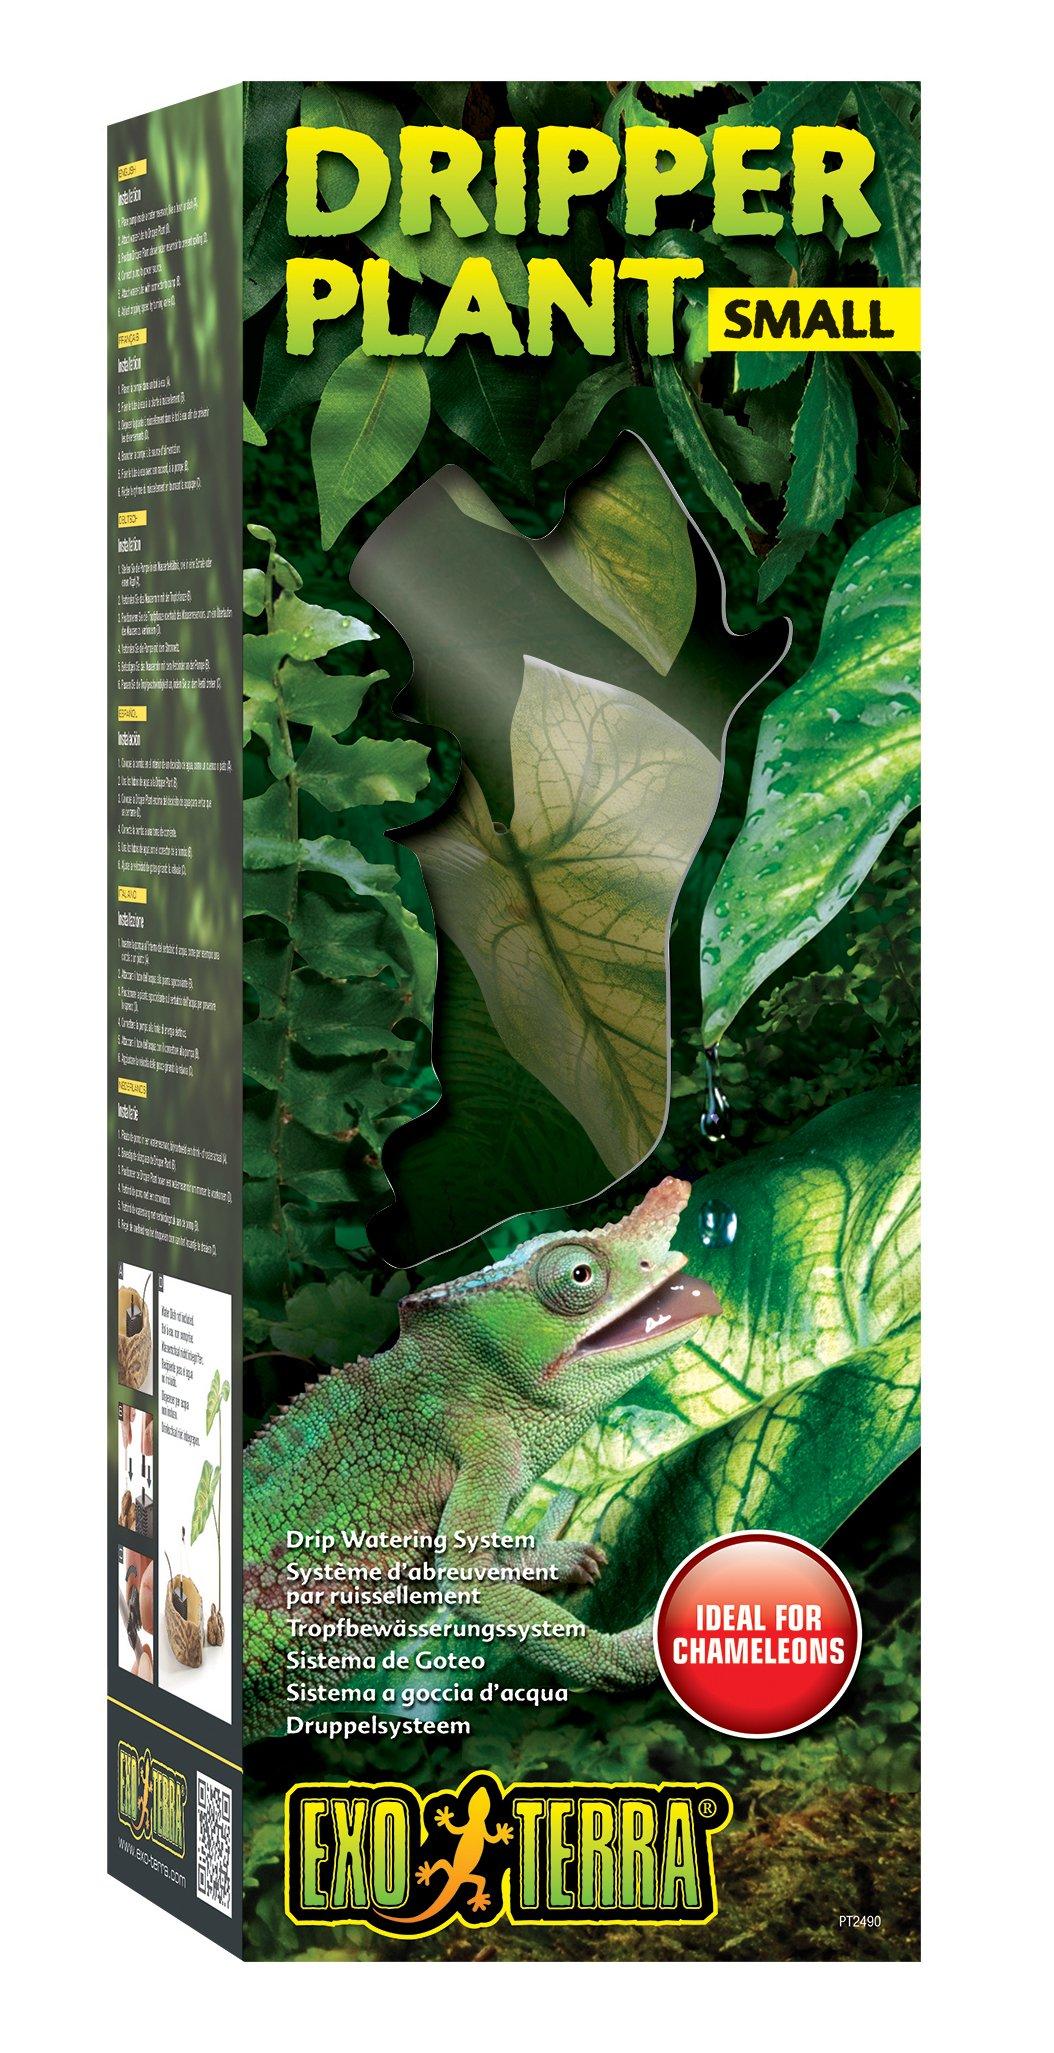 Exo Terra Dripper Plant Drip Watering System: Chameleon Habitat: Amazon.com